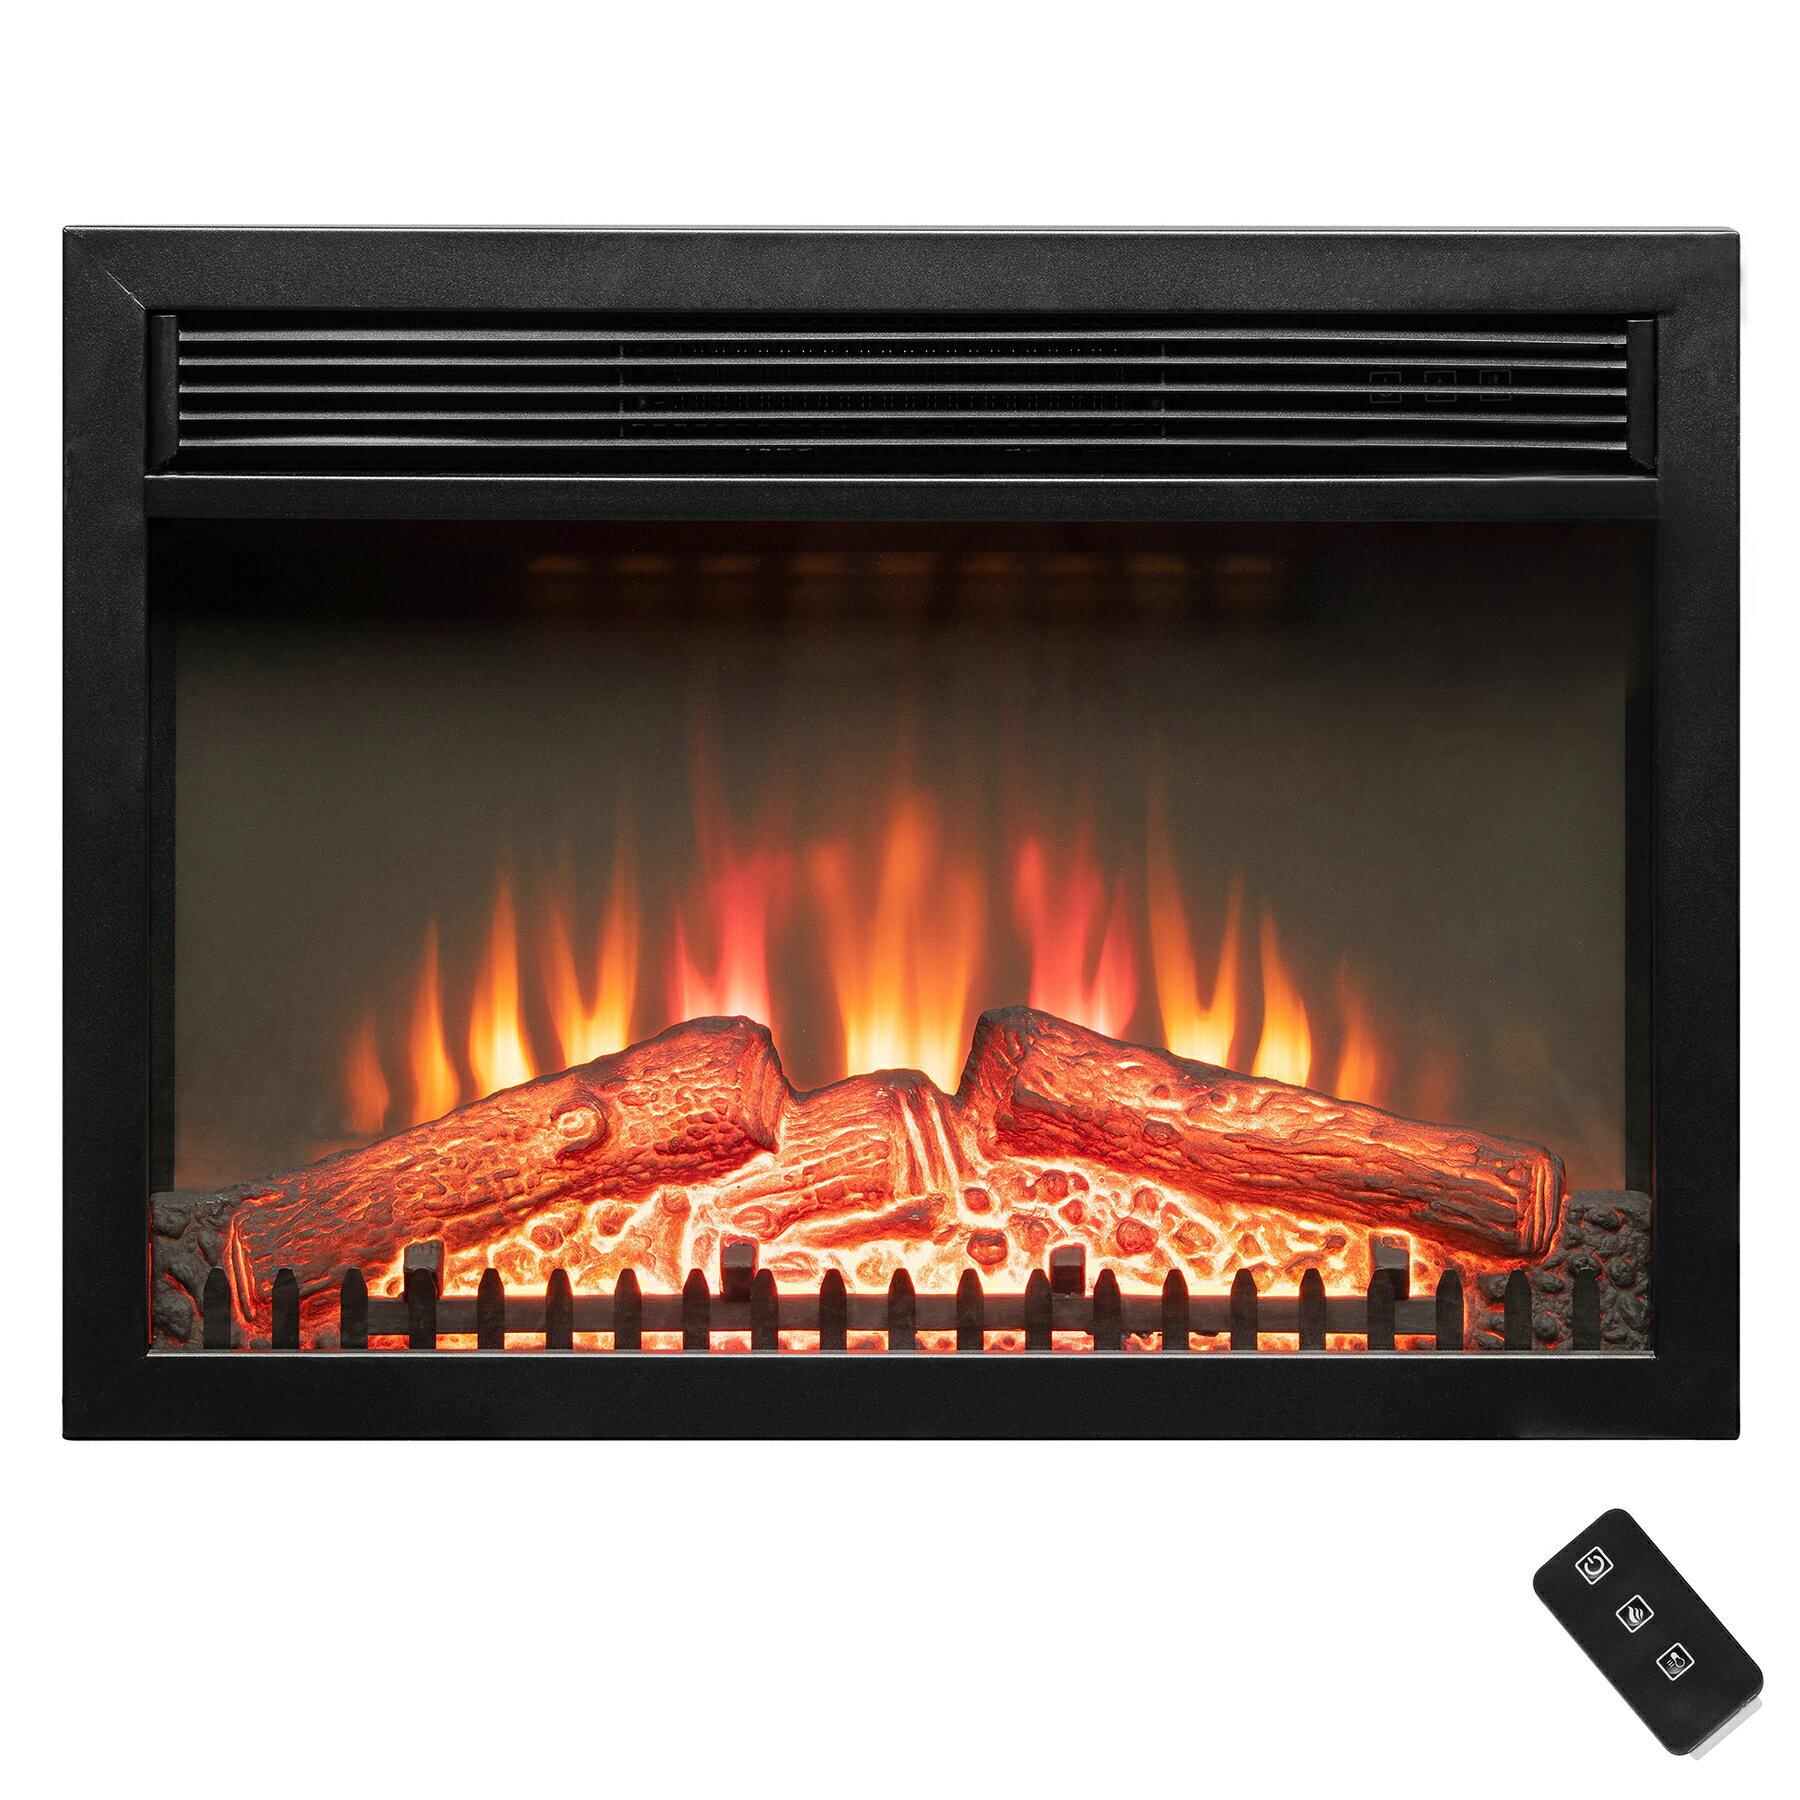 Akdy 23 Black Freestanding Logs Portable Electric Fireplace Heater